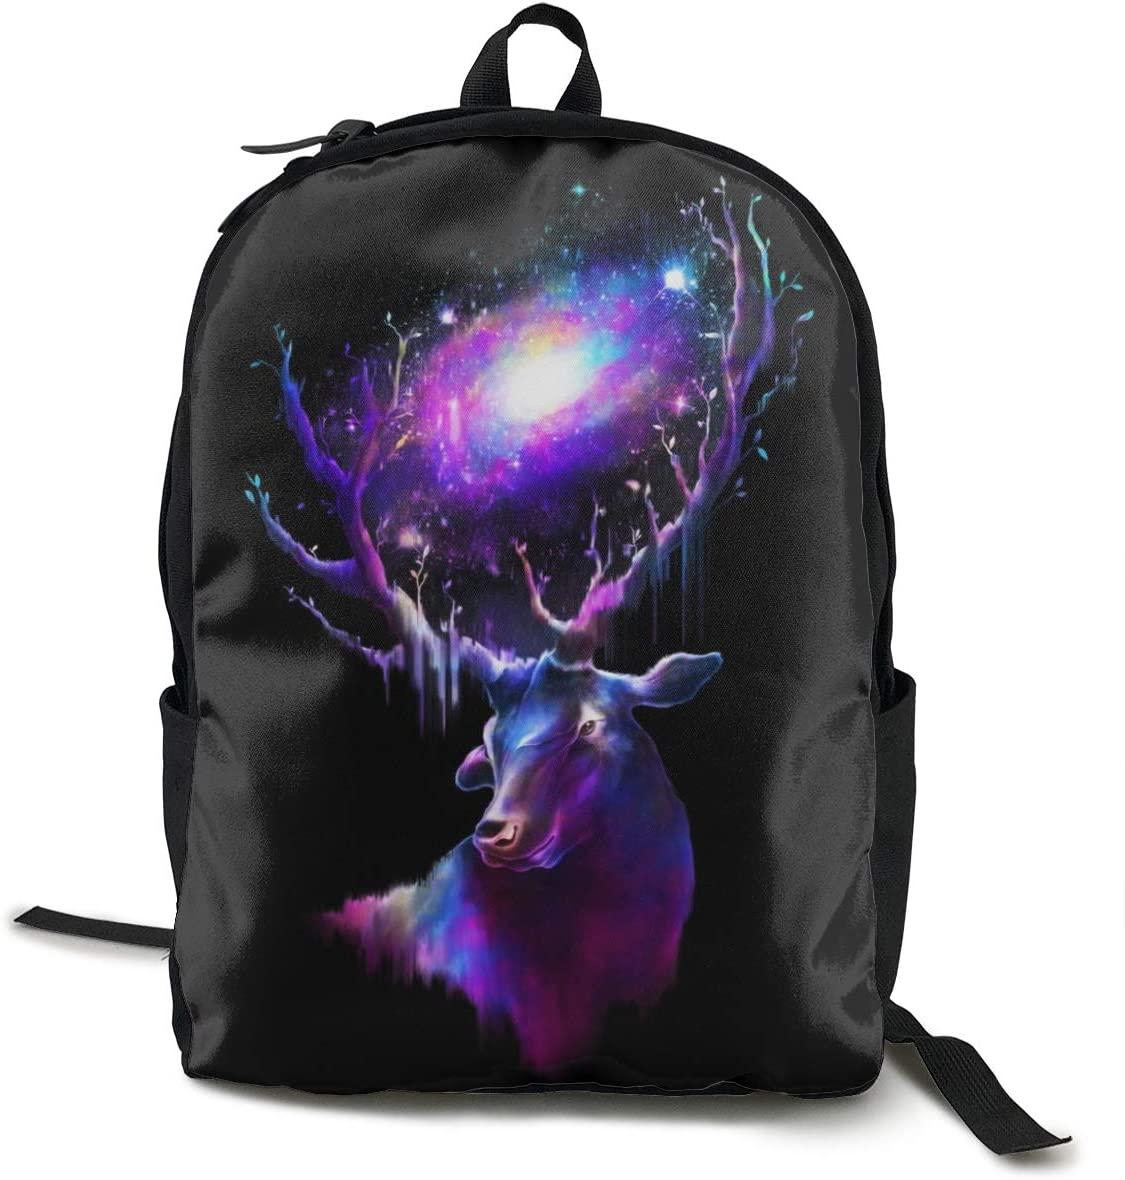 NiYoung Women Men Fashion Large Capacity Anti Thief Travel Business Computer Backpack, Durable Waterproof College School Students Bookbag - Galaxy Elk Deer Universe